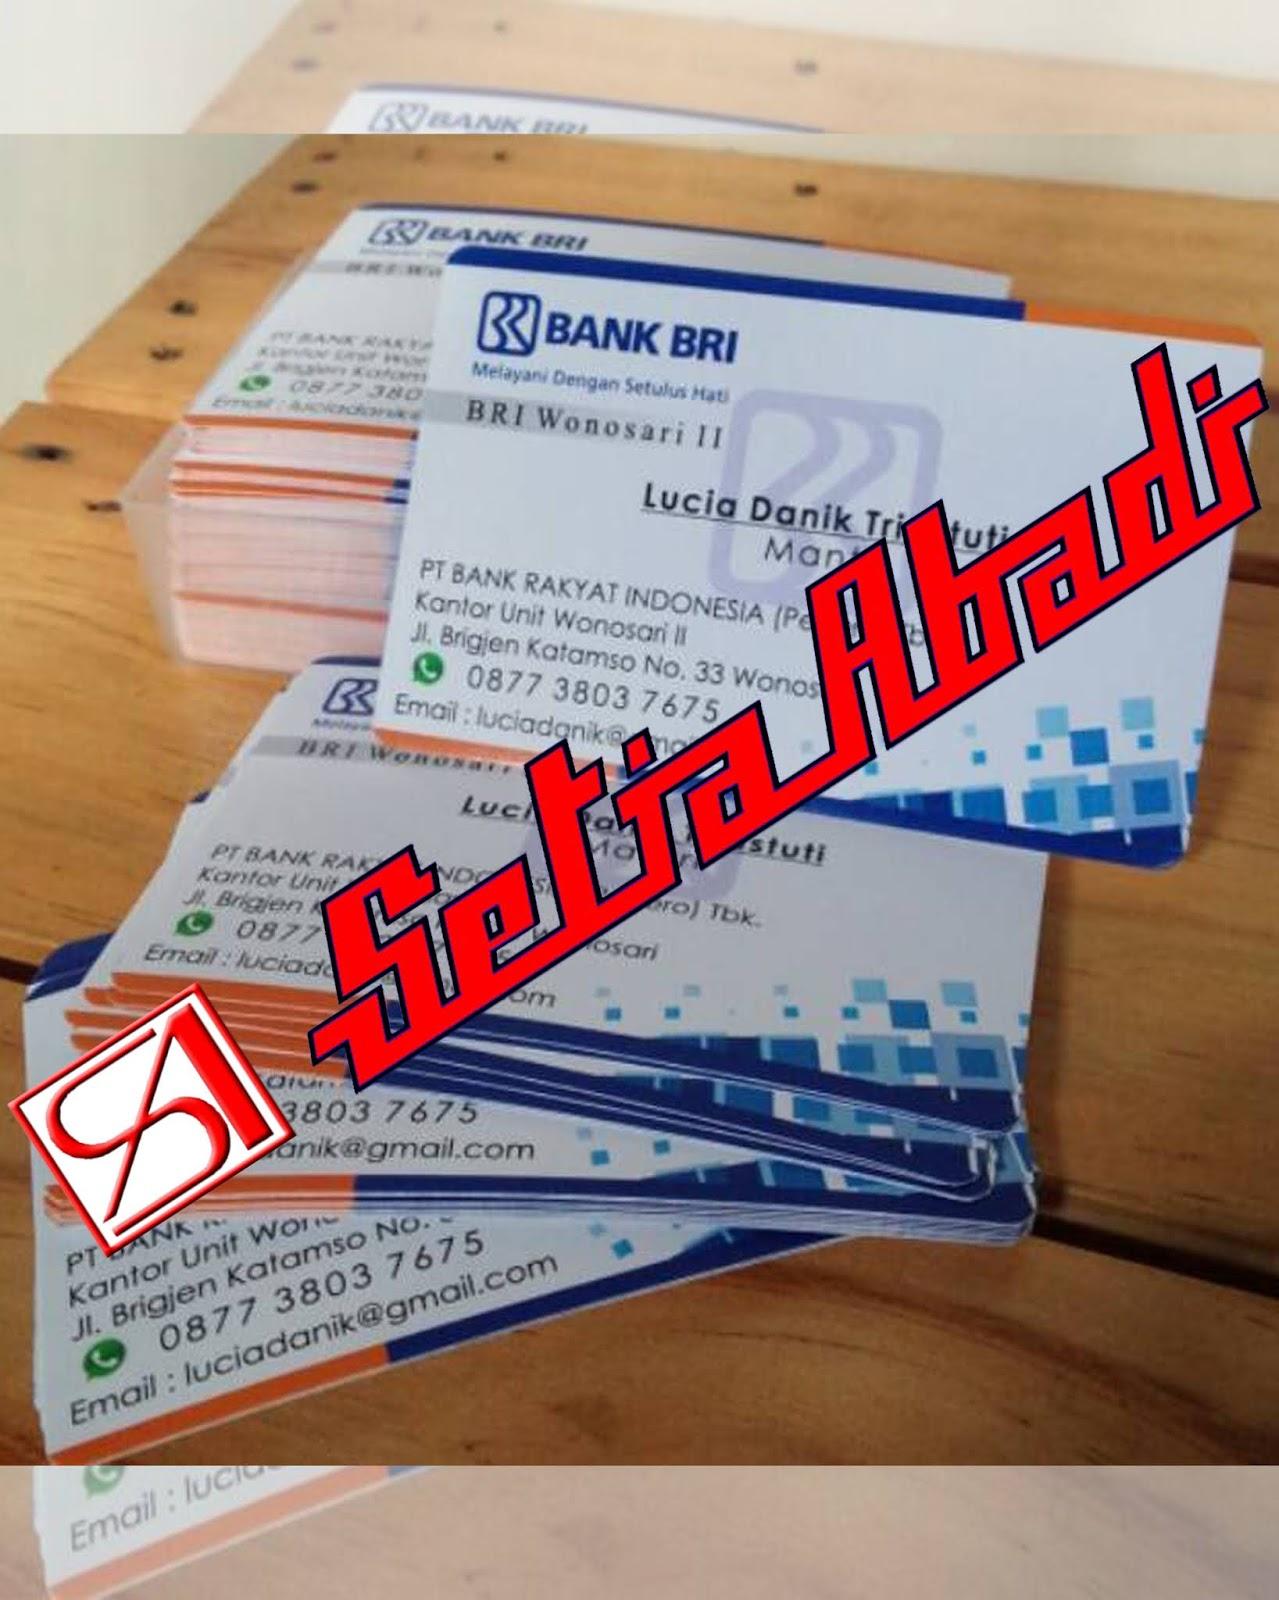 https://www.offsetprinting21.com/2019/01/jasa-cetak-kartu-nama-di-jakarta_7.html